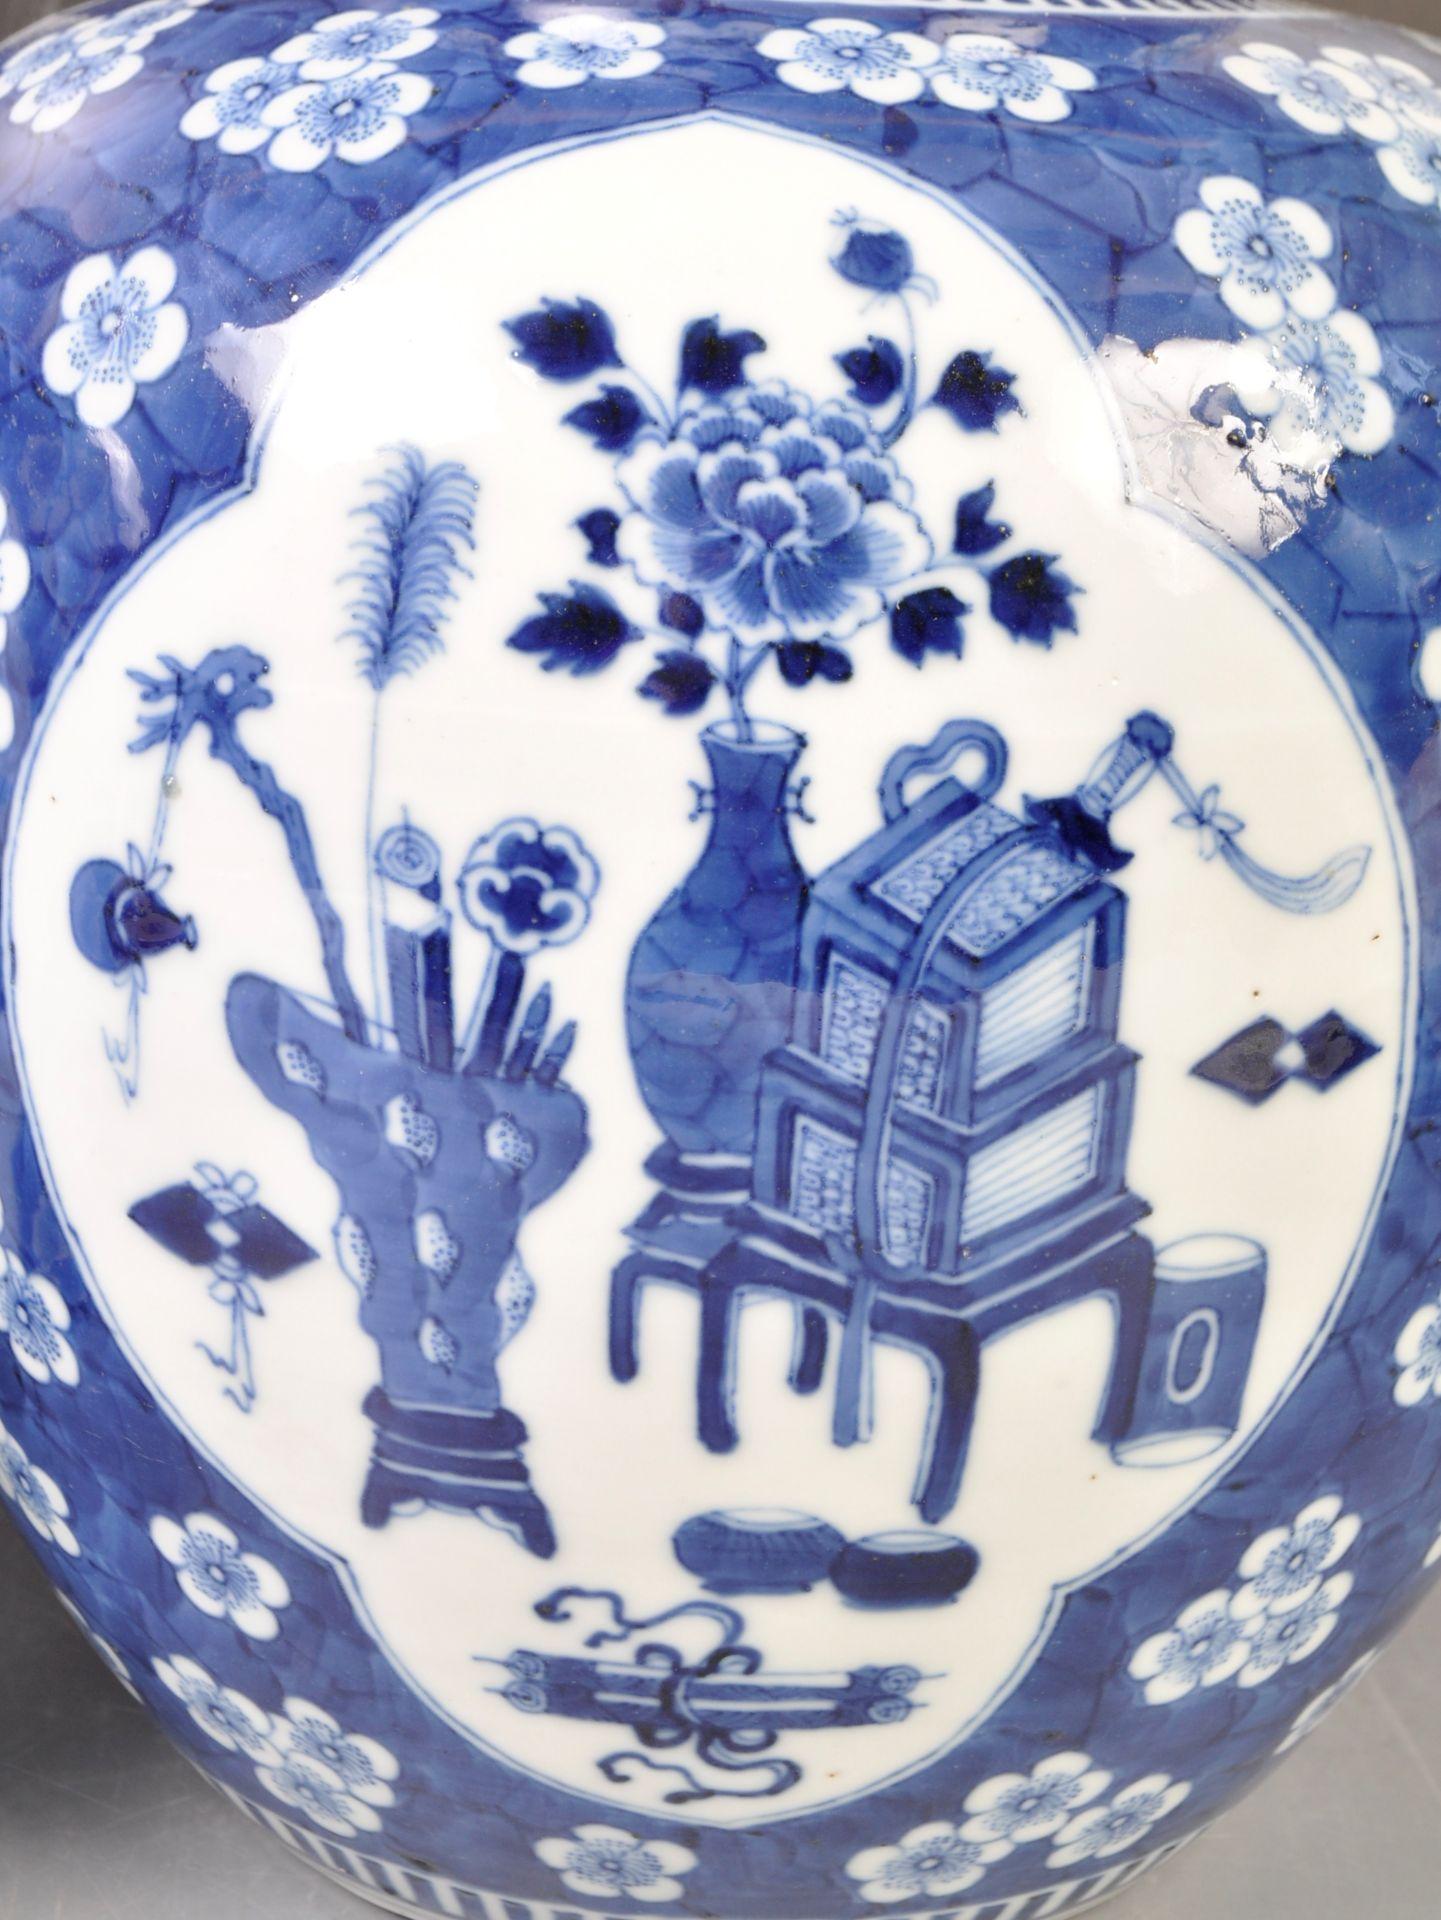 LARGE AND IMPRESSIVE PAIR OF CHINESE KANGXI MARK LIDDED JARS - Image 10 of 13